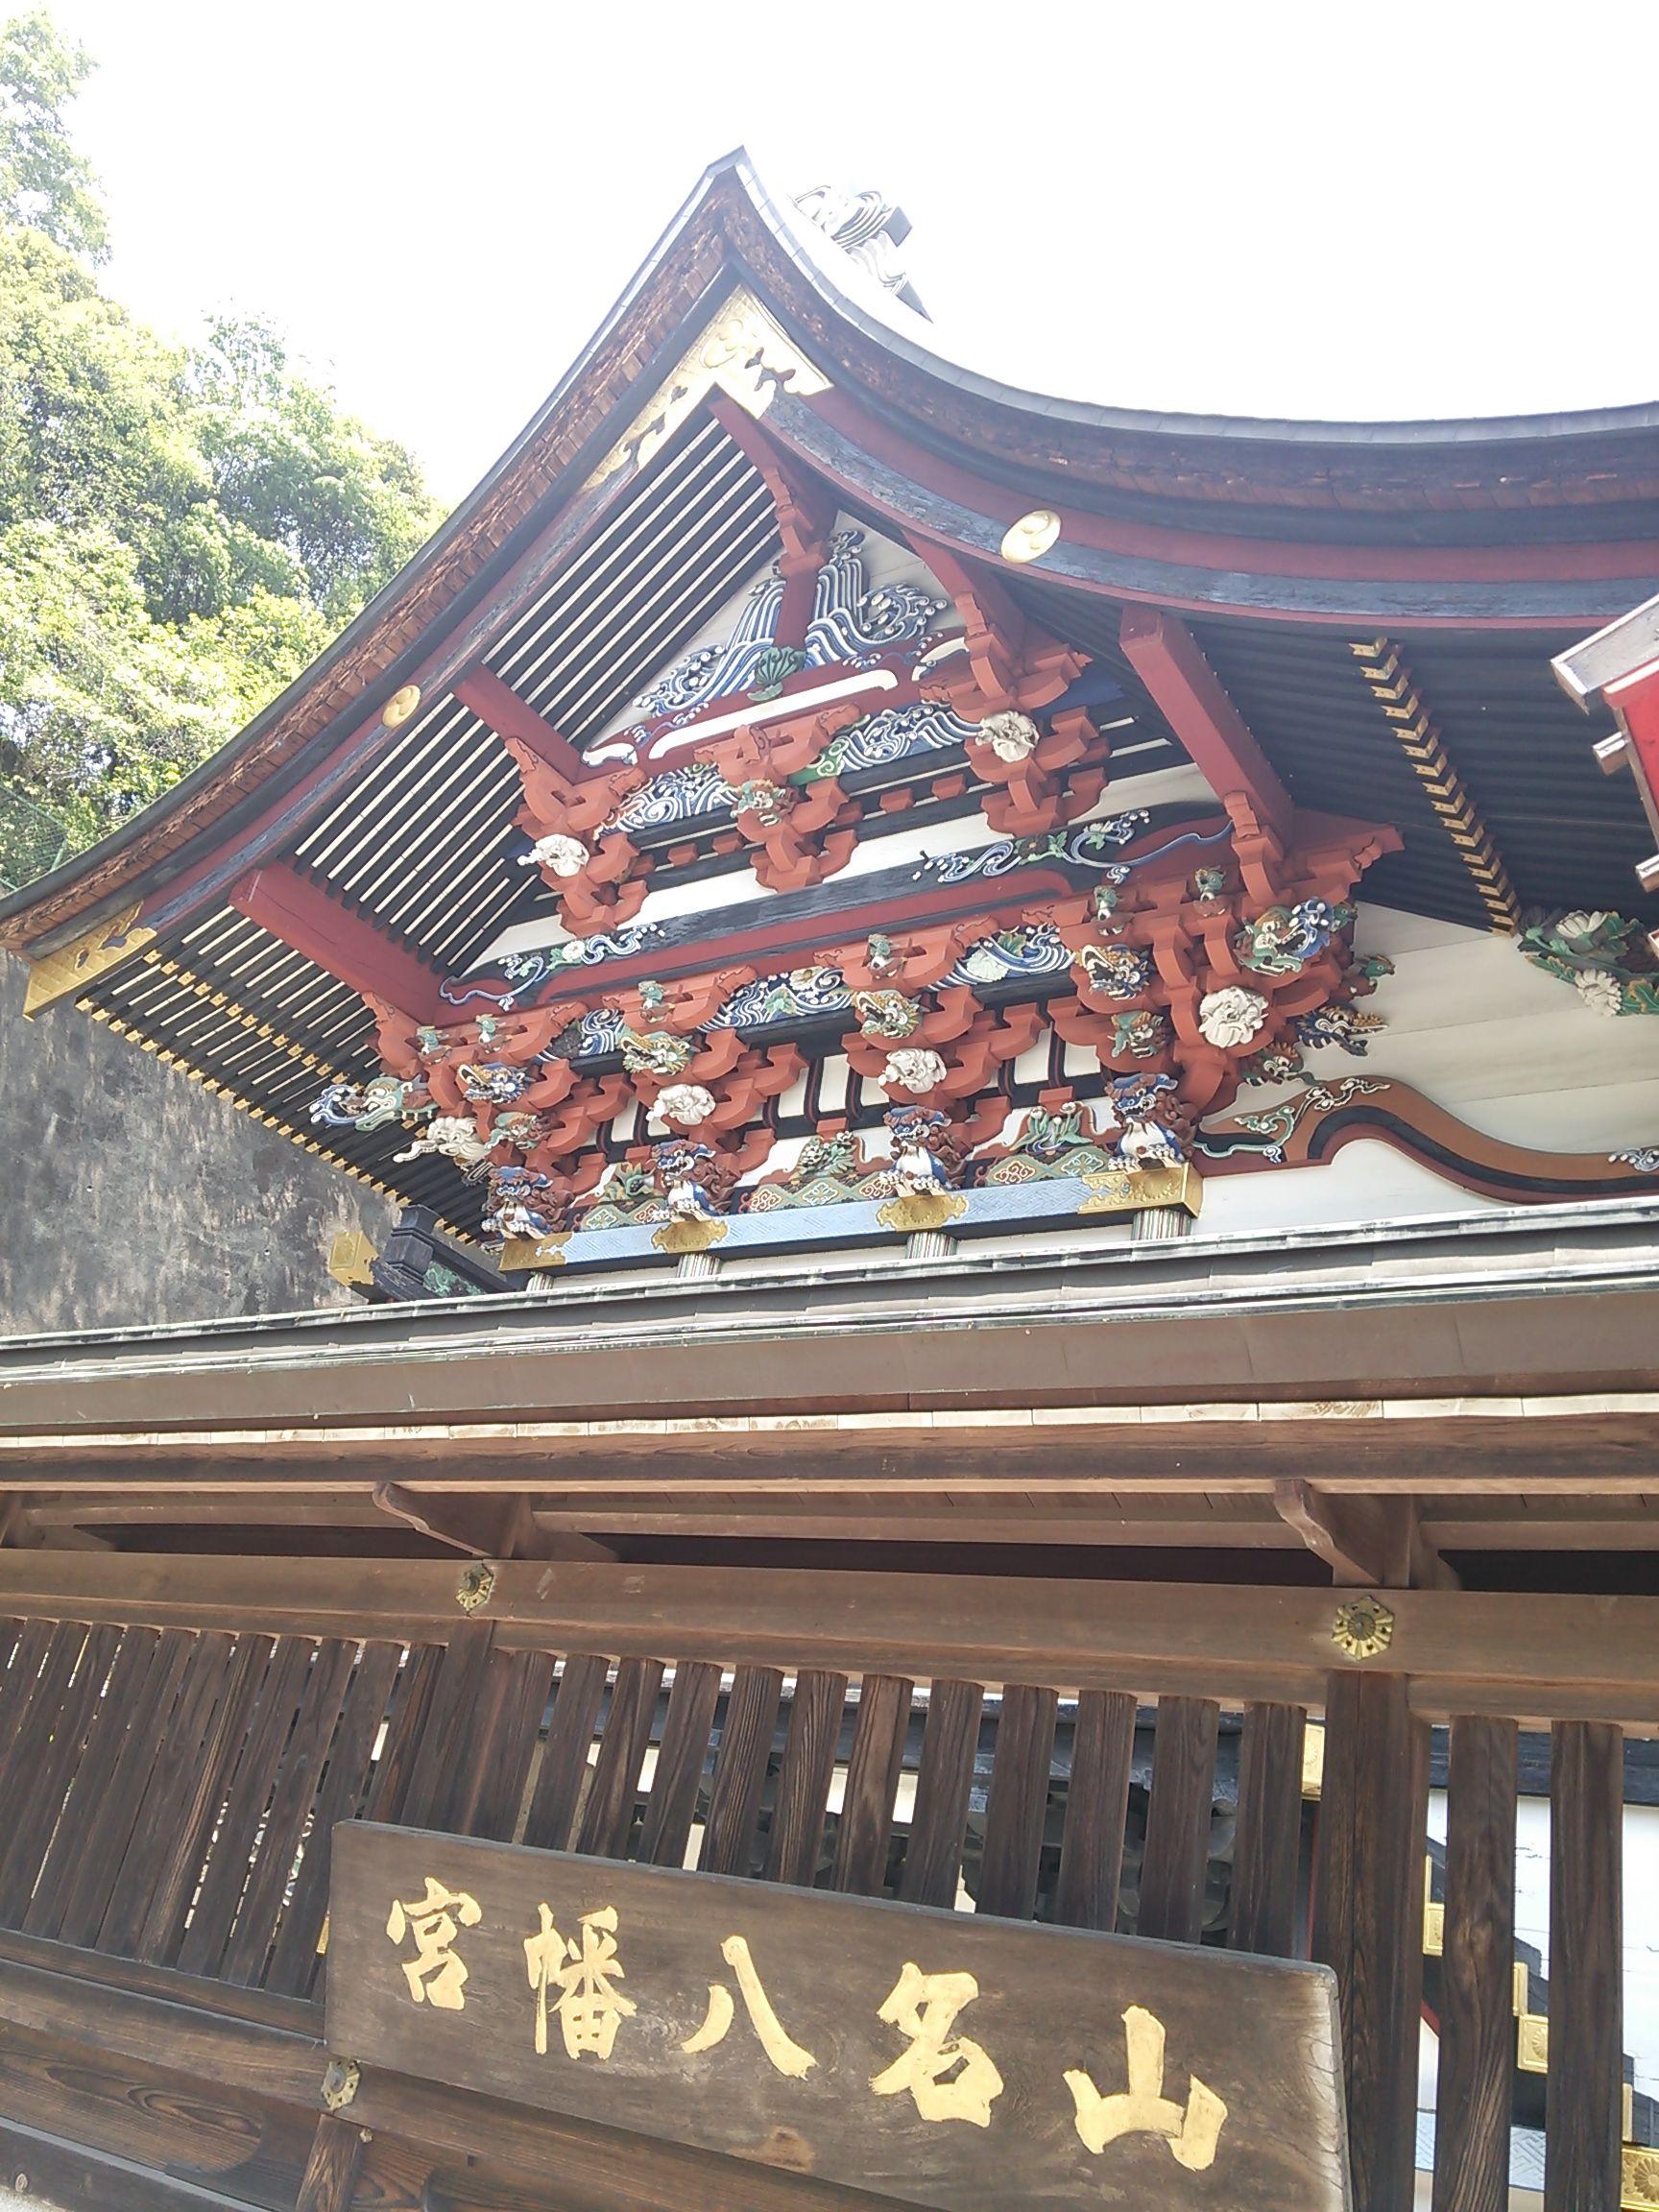 The Yamana shrine (Yamana-Hachimangu)